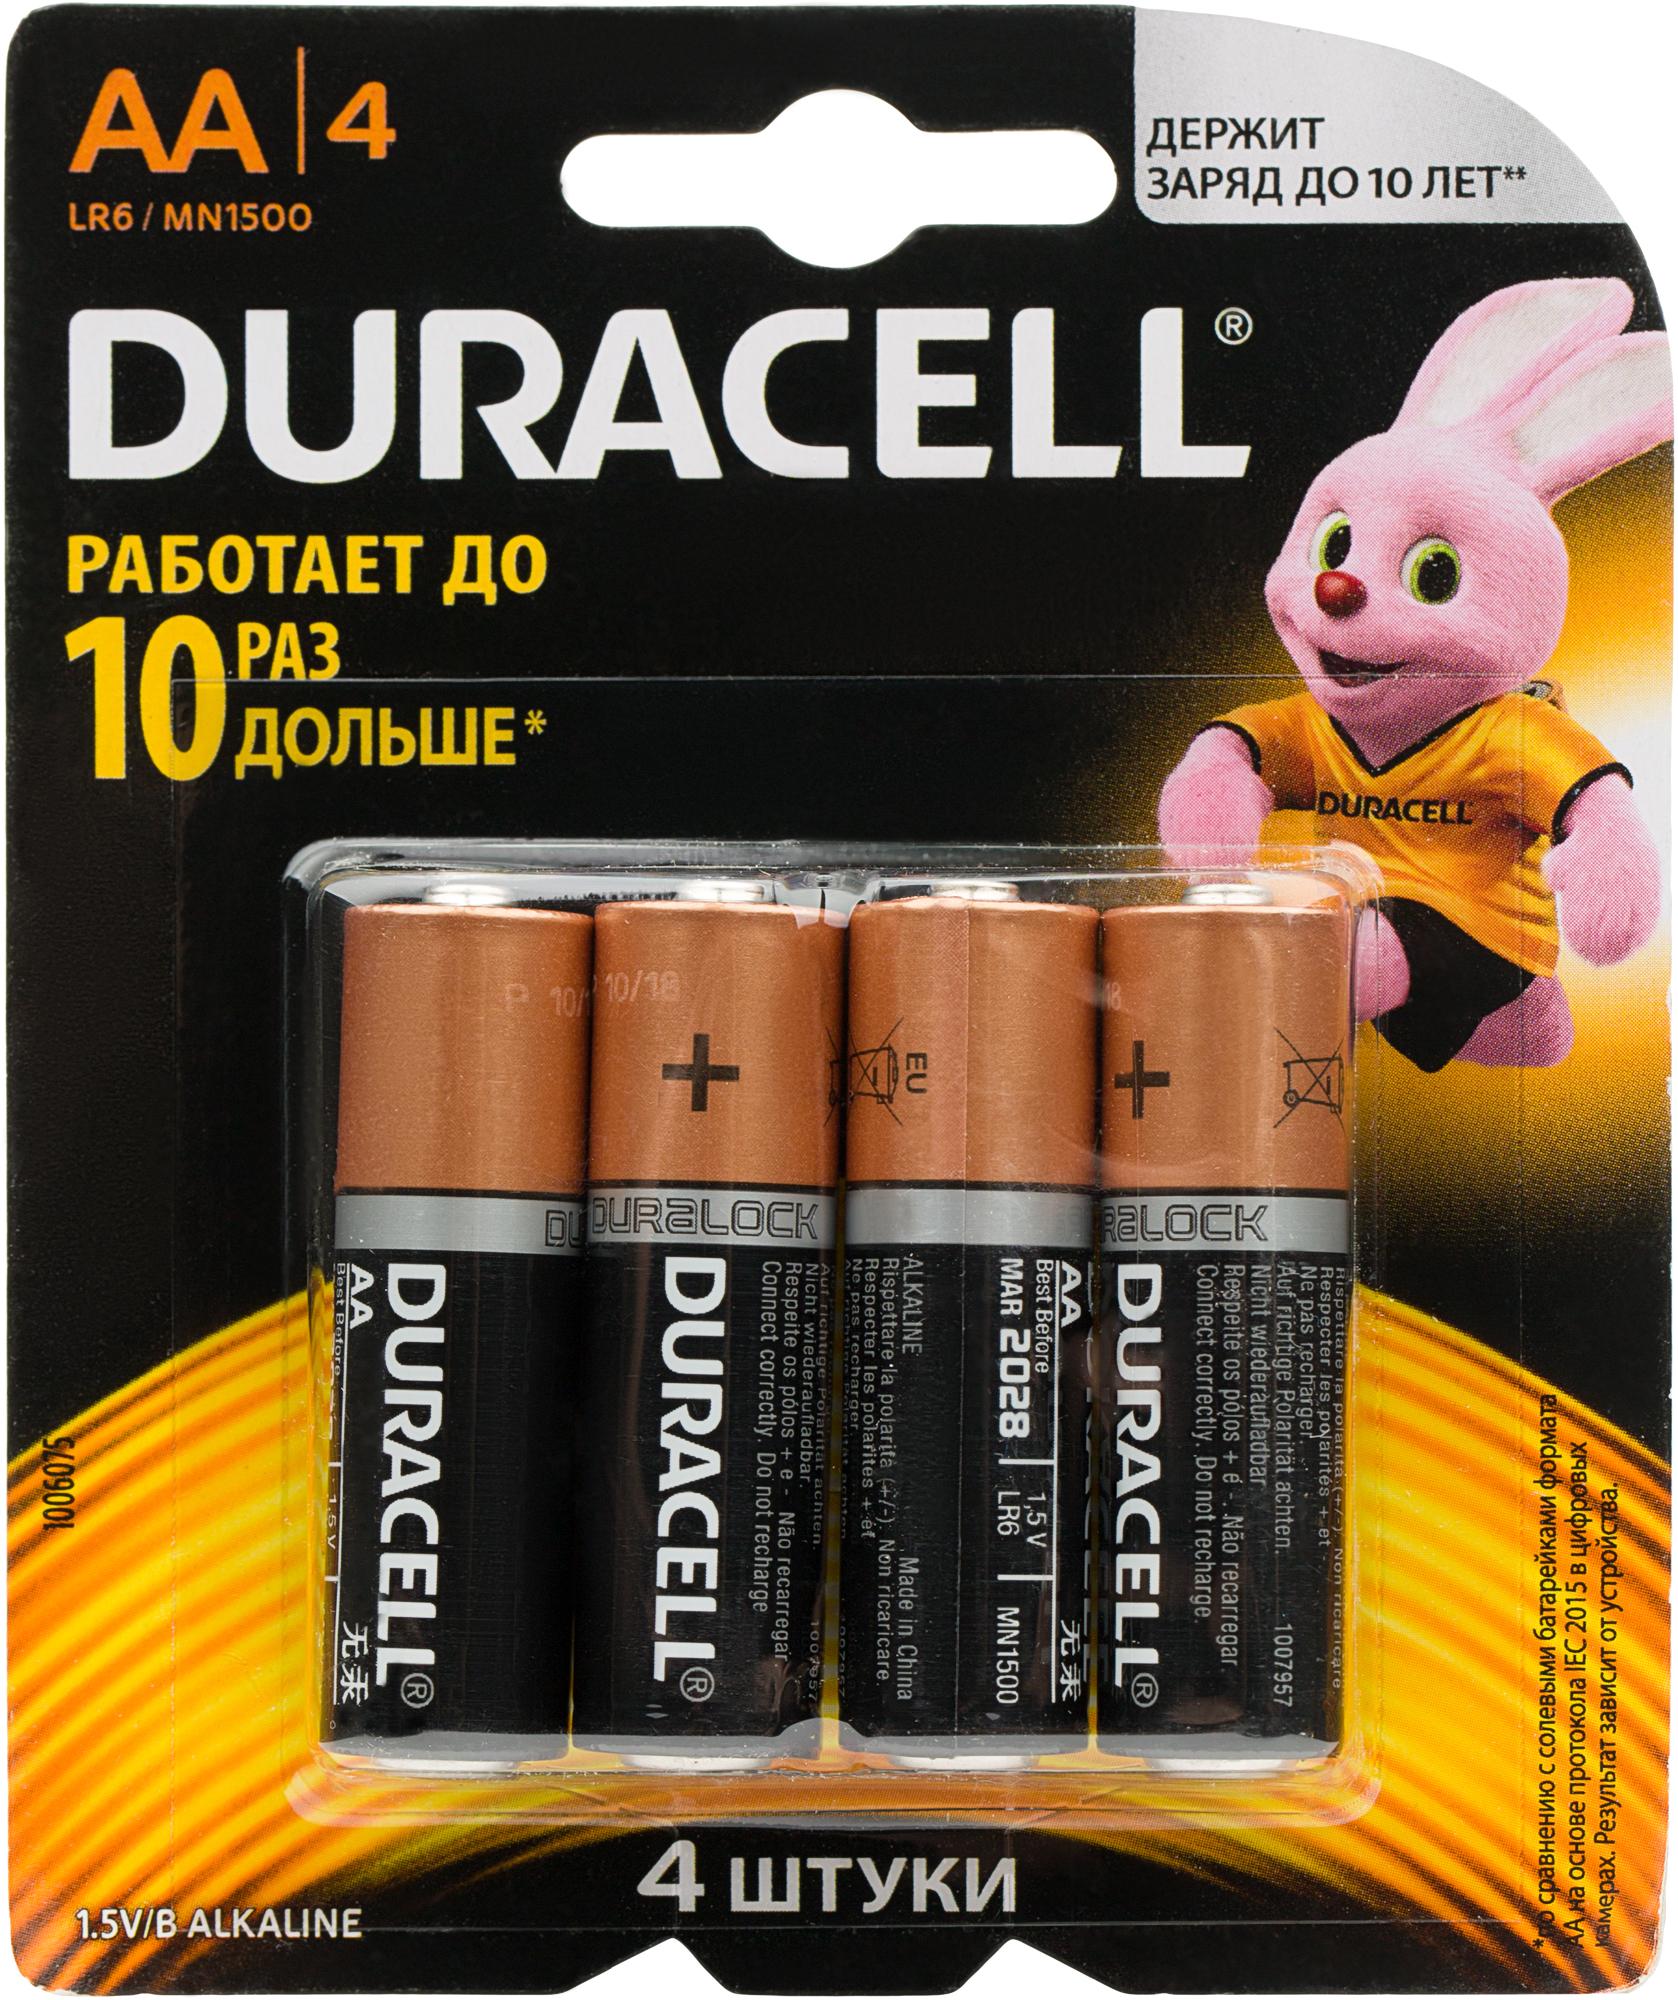 Duracell Батарейки щелочные Duracell BASIC CN АА/LR6, 4 шт. цена